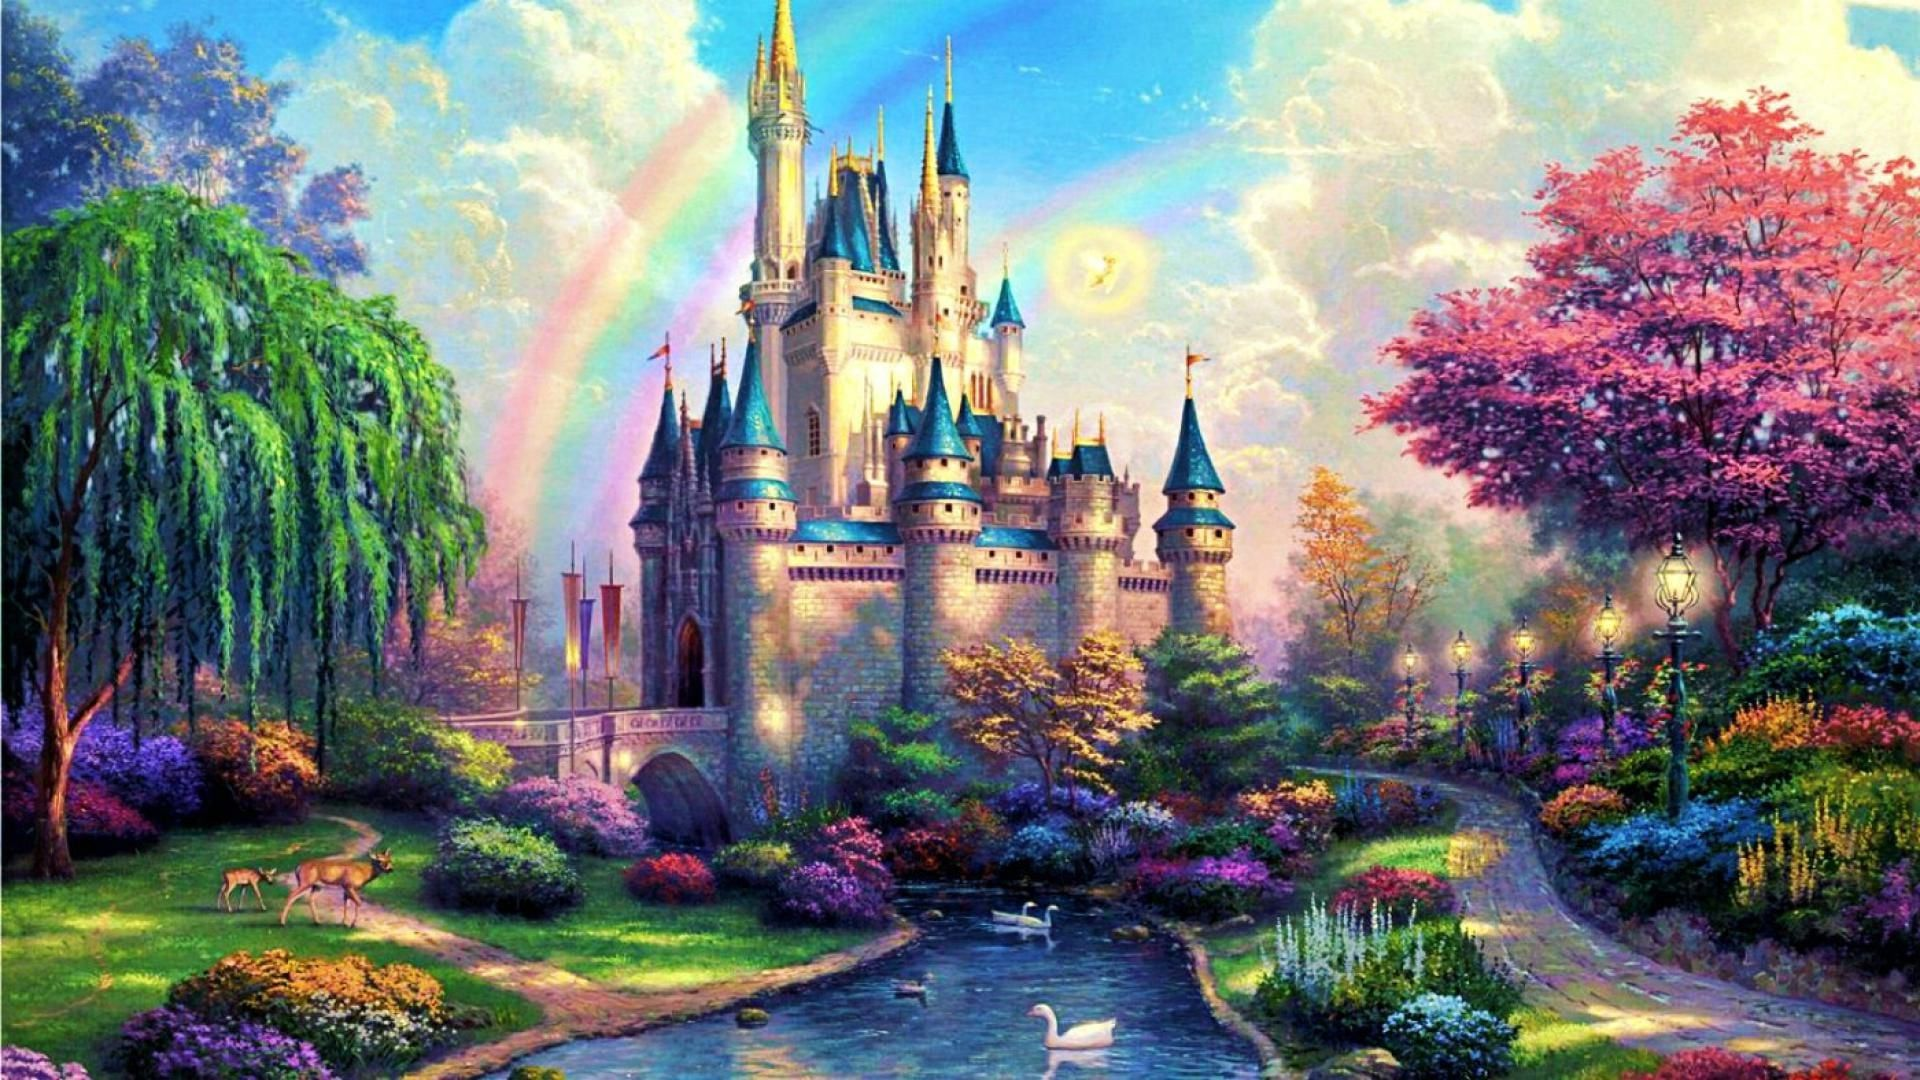 fairytale castle | fairy tale wallpaper related keywords